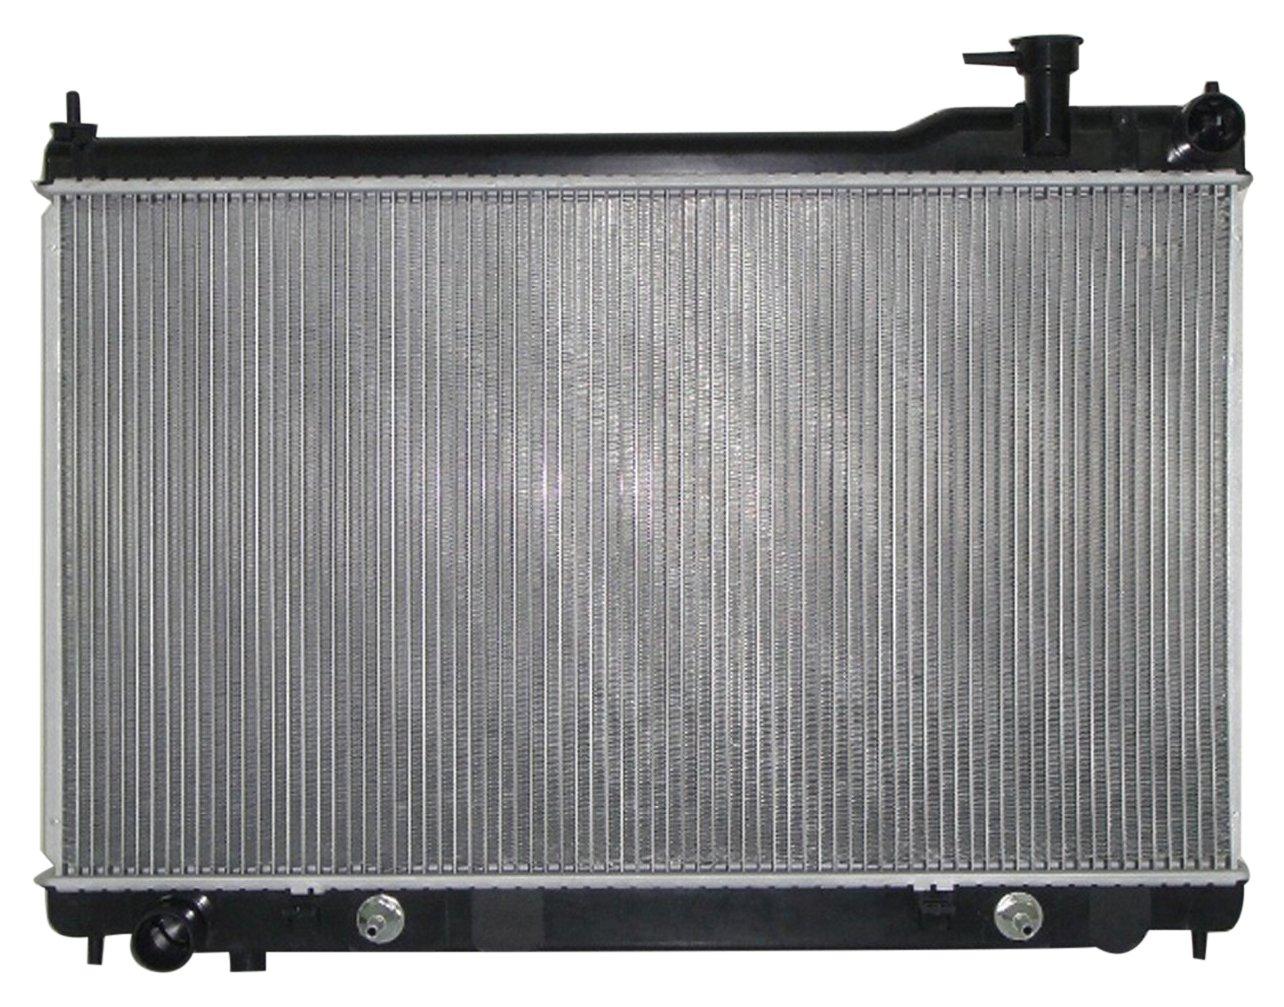 INFINITI G-35 SEDAN 3.5L V6 03-04 AT Depo 325-56003-010 Radiator